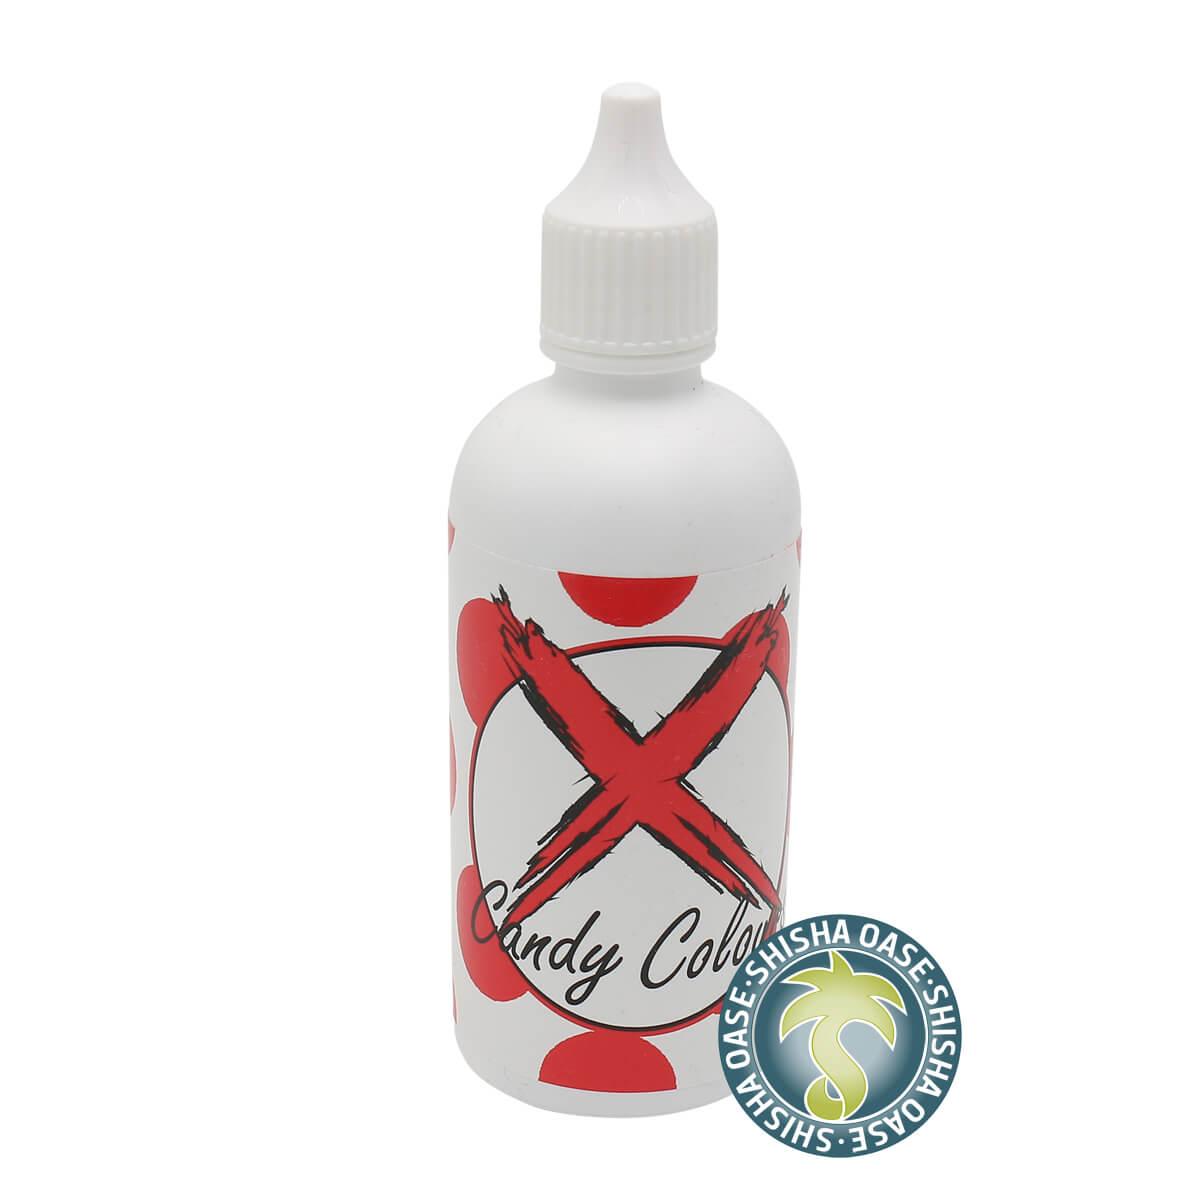 Xschischa Candy Colour 100ml | Red